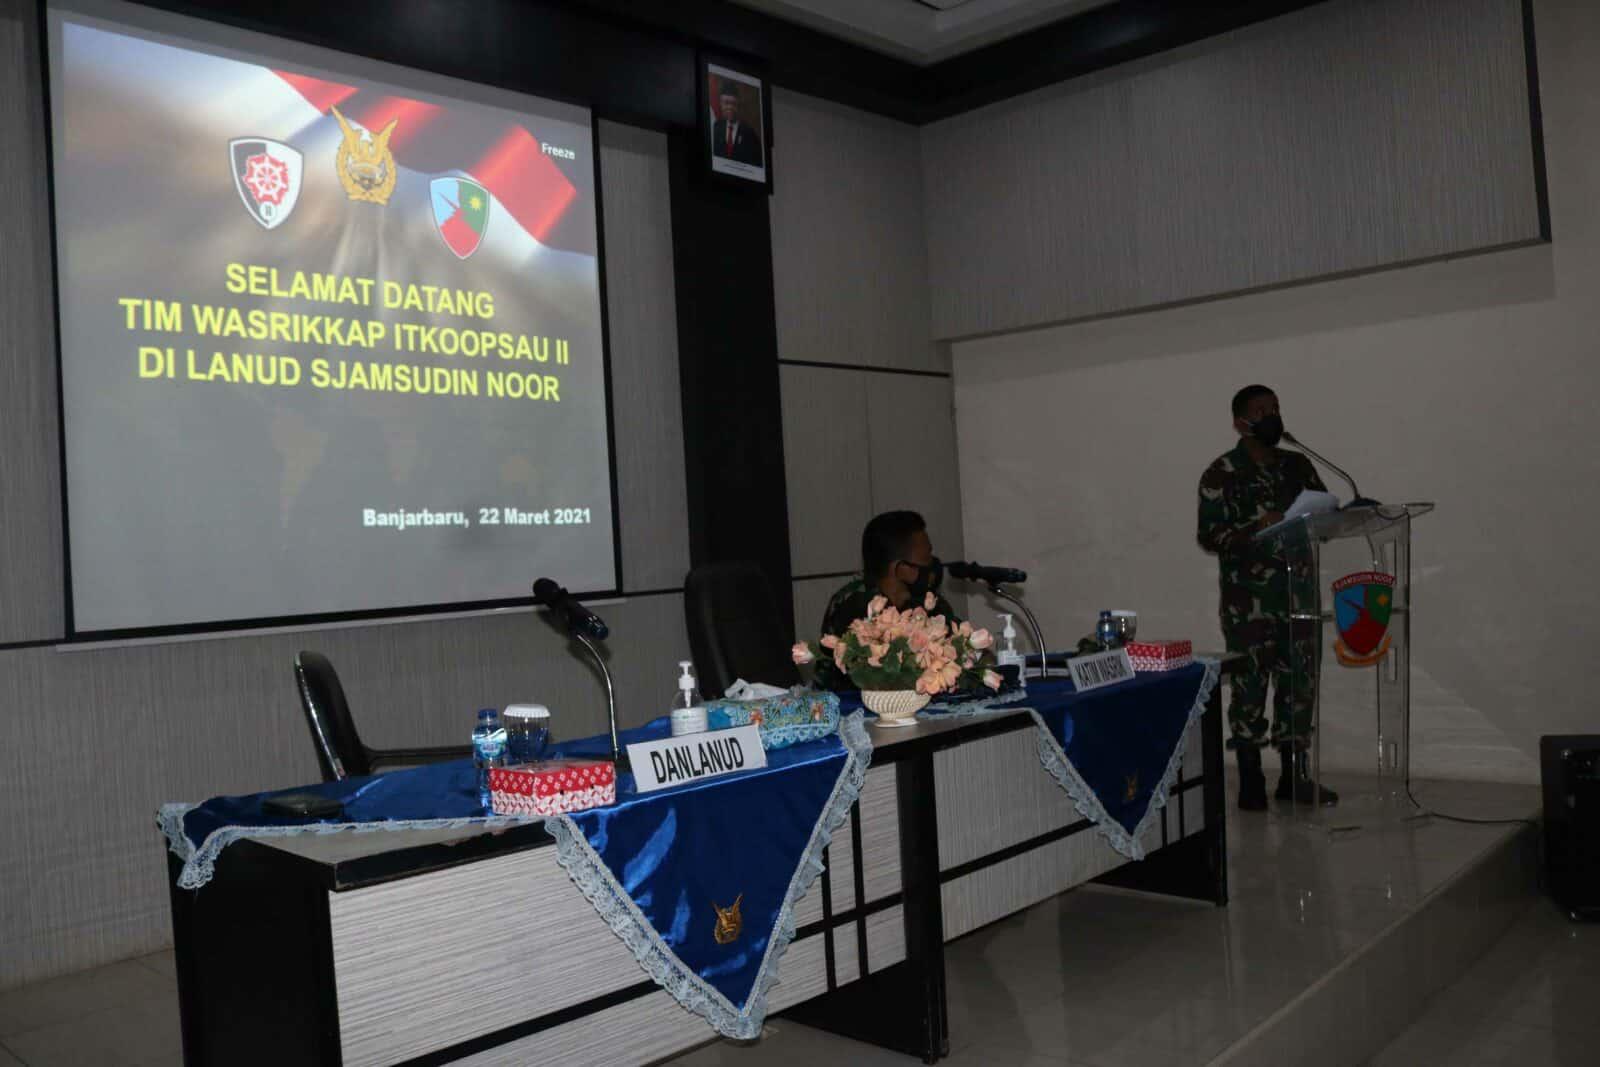 Pengawasan Dan Pemeriksaan Tim Wasrikkap Inspektorat Koopsau II Di Lanud Sjamsudin Noor